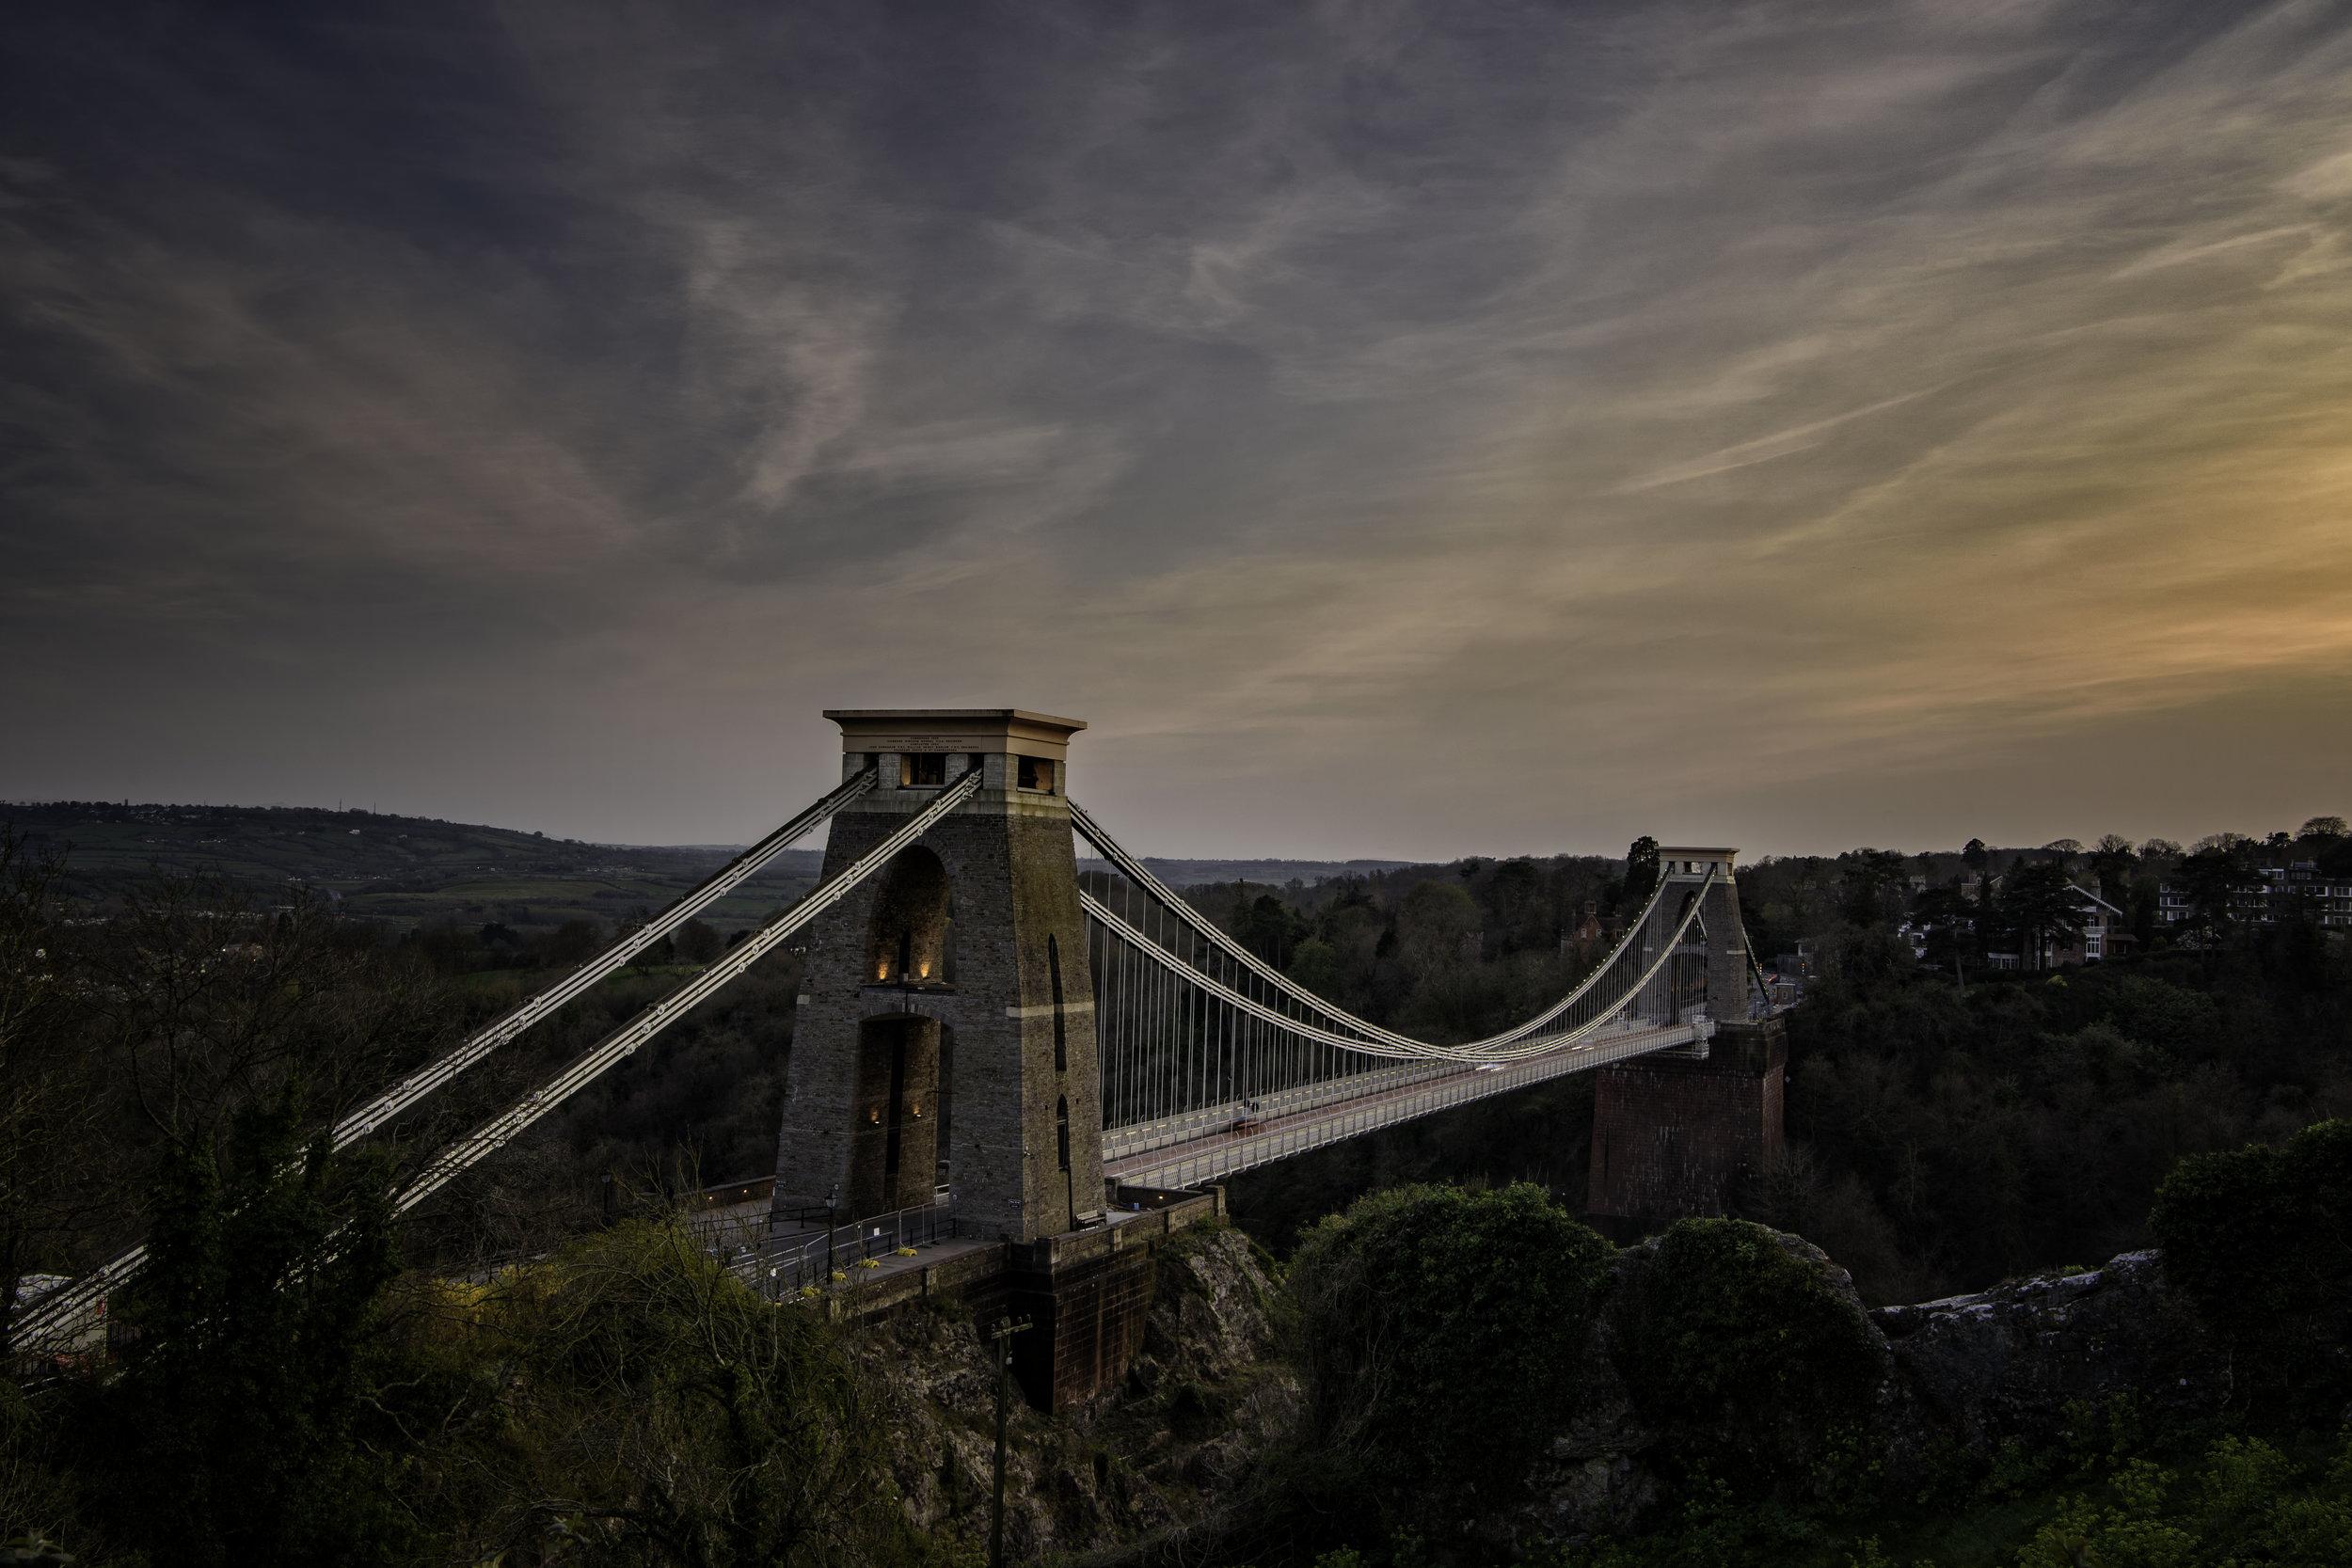 Sunset across the bridge